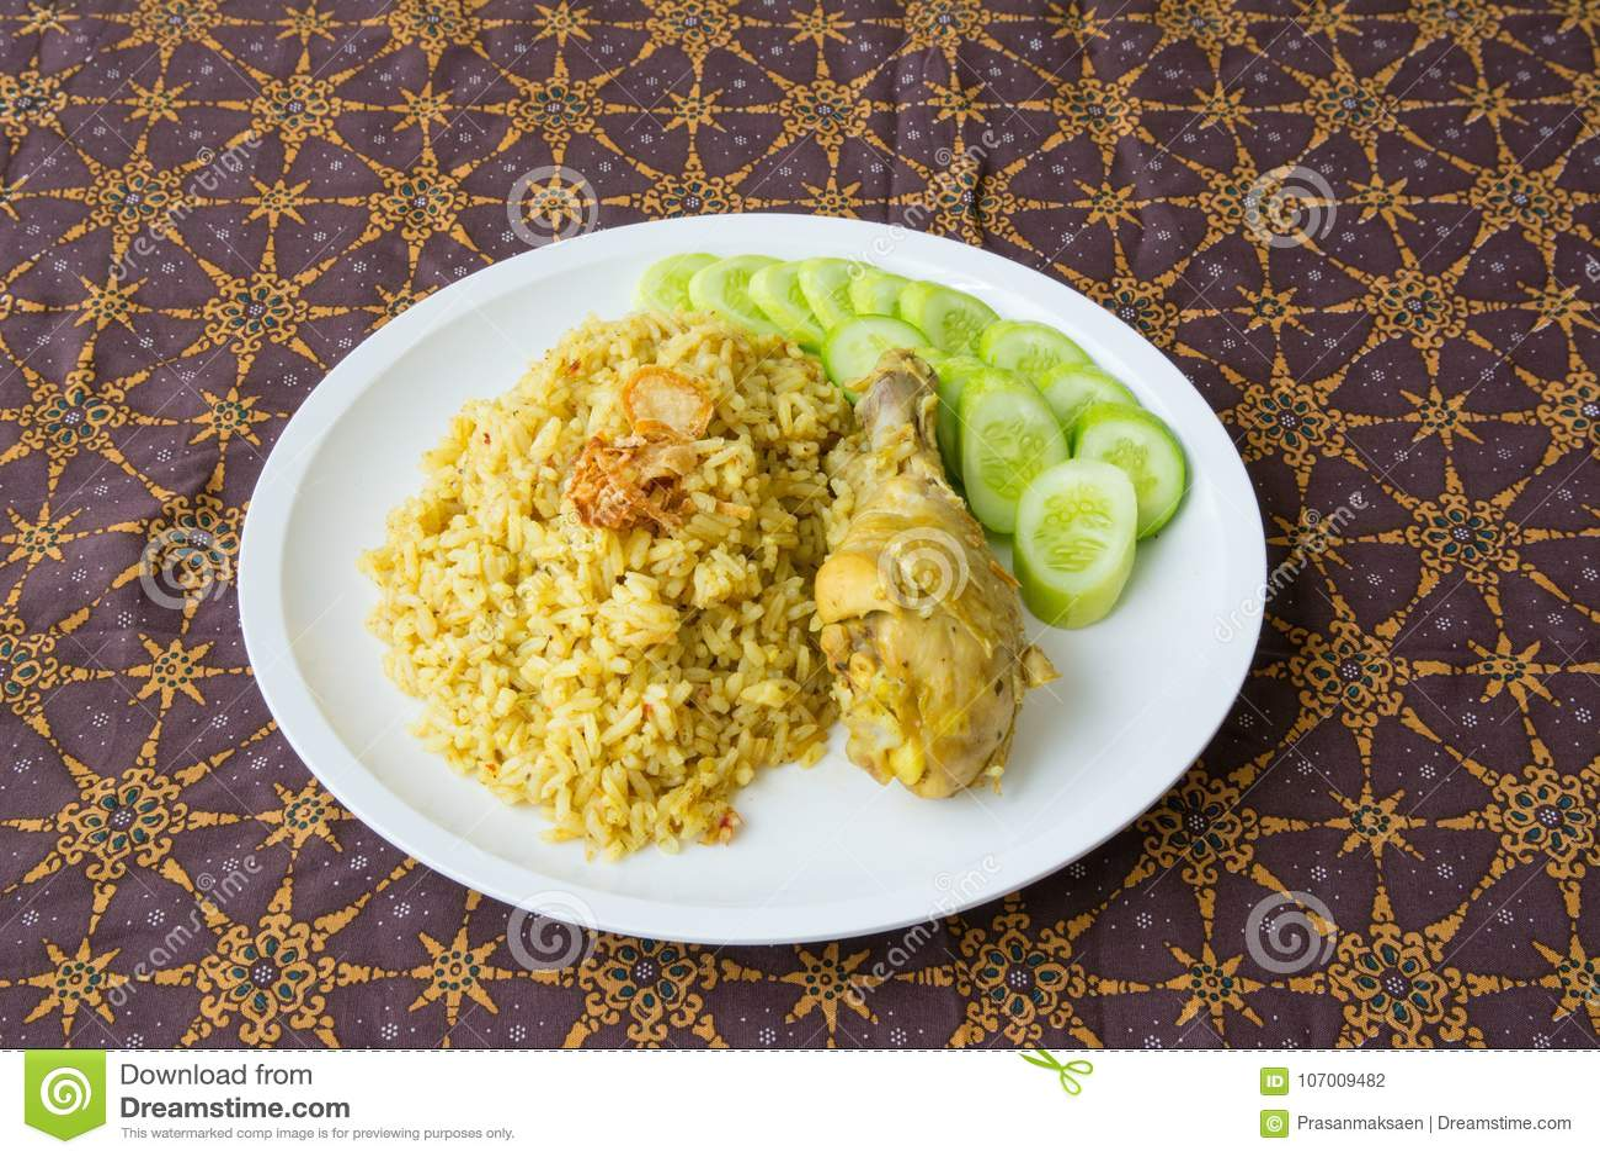 Halal food Arab rice stock photo  Image of indian, asian